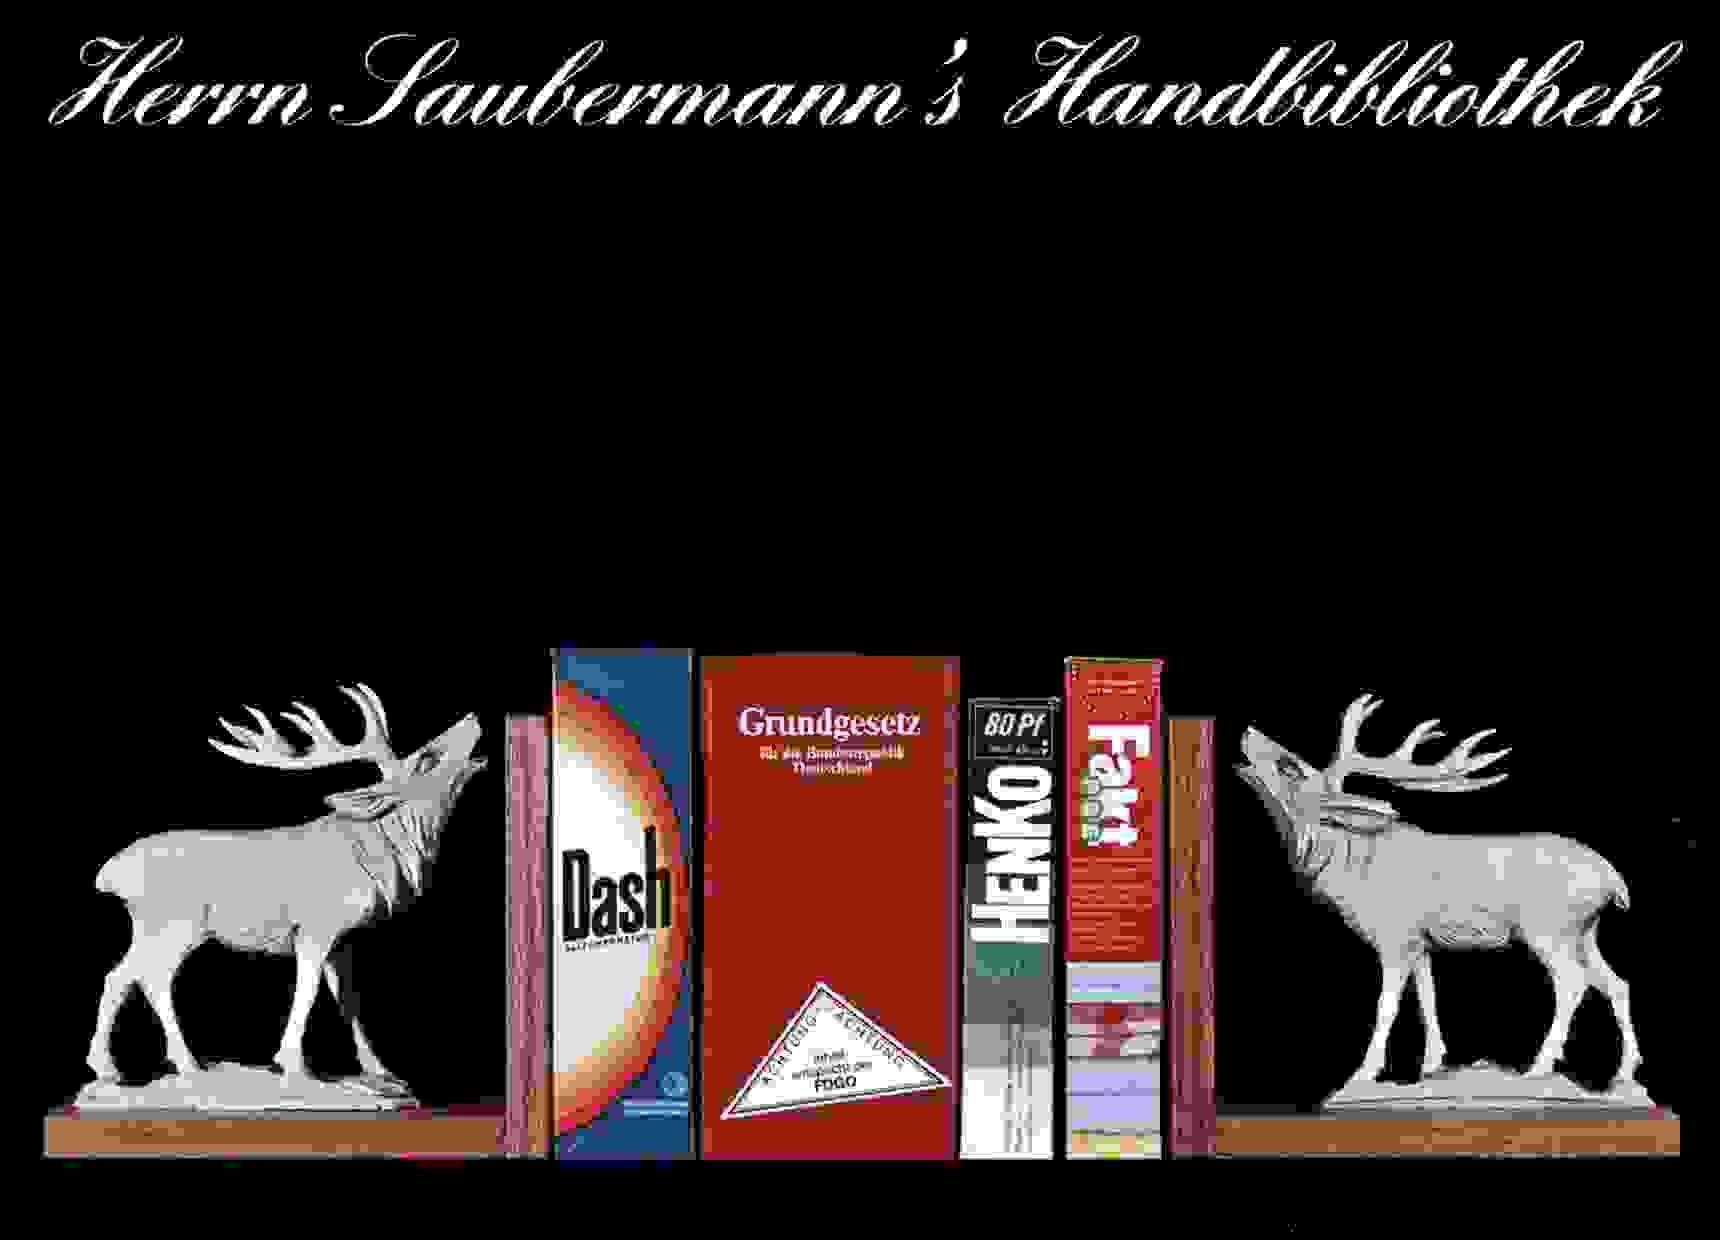 Herrn Saubermanns Handbibliothek